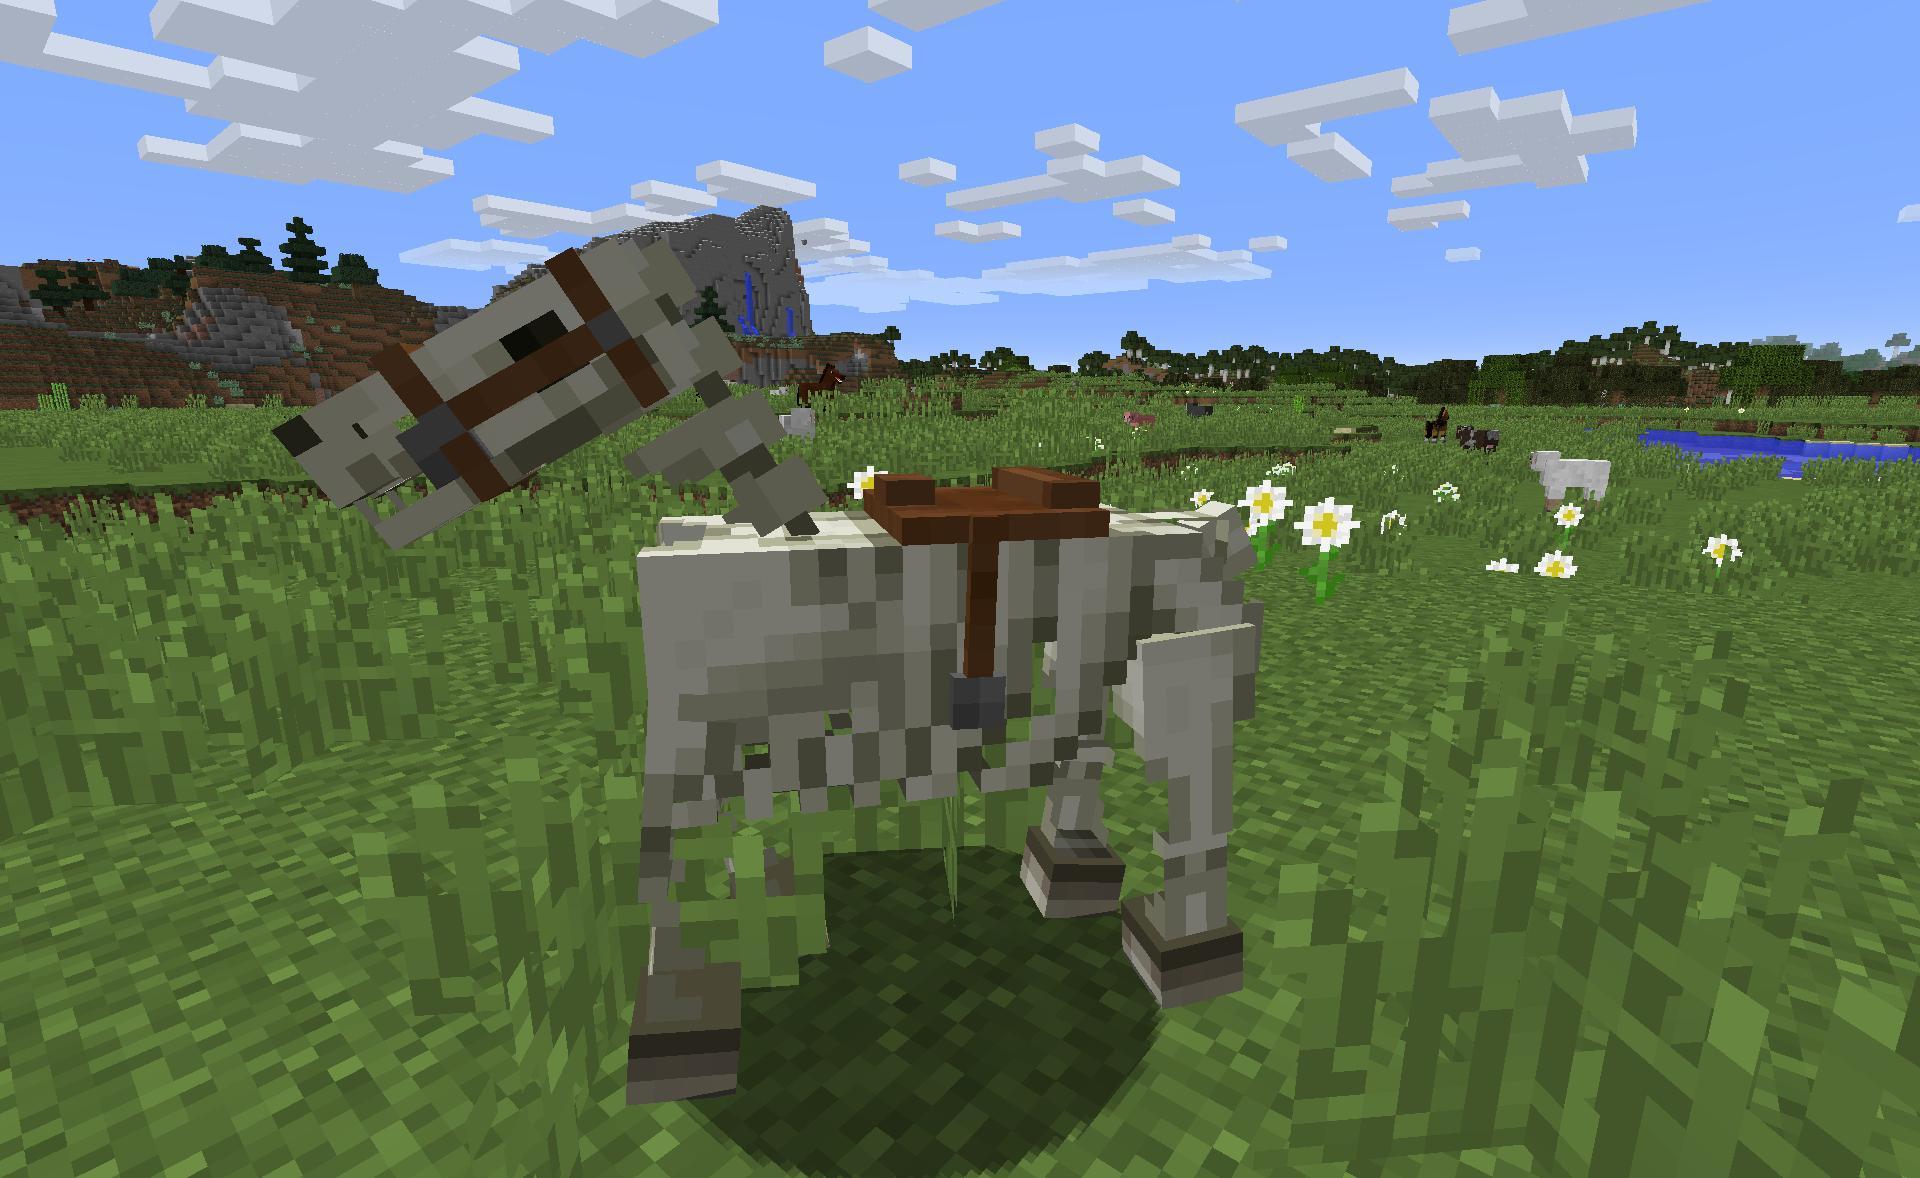 Minecraft snapshot 15w38a le test complet fr minecraft - Cheval minecraft ...